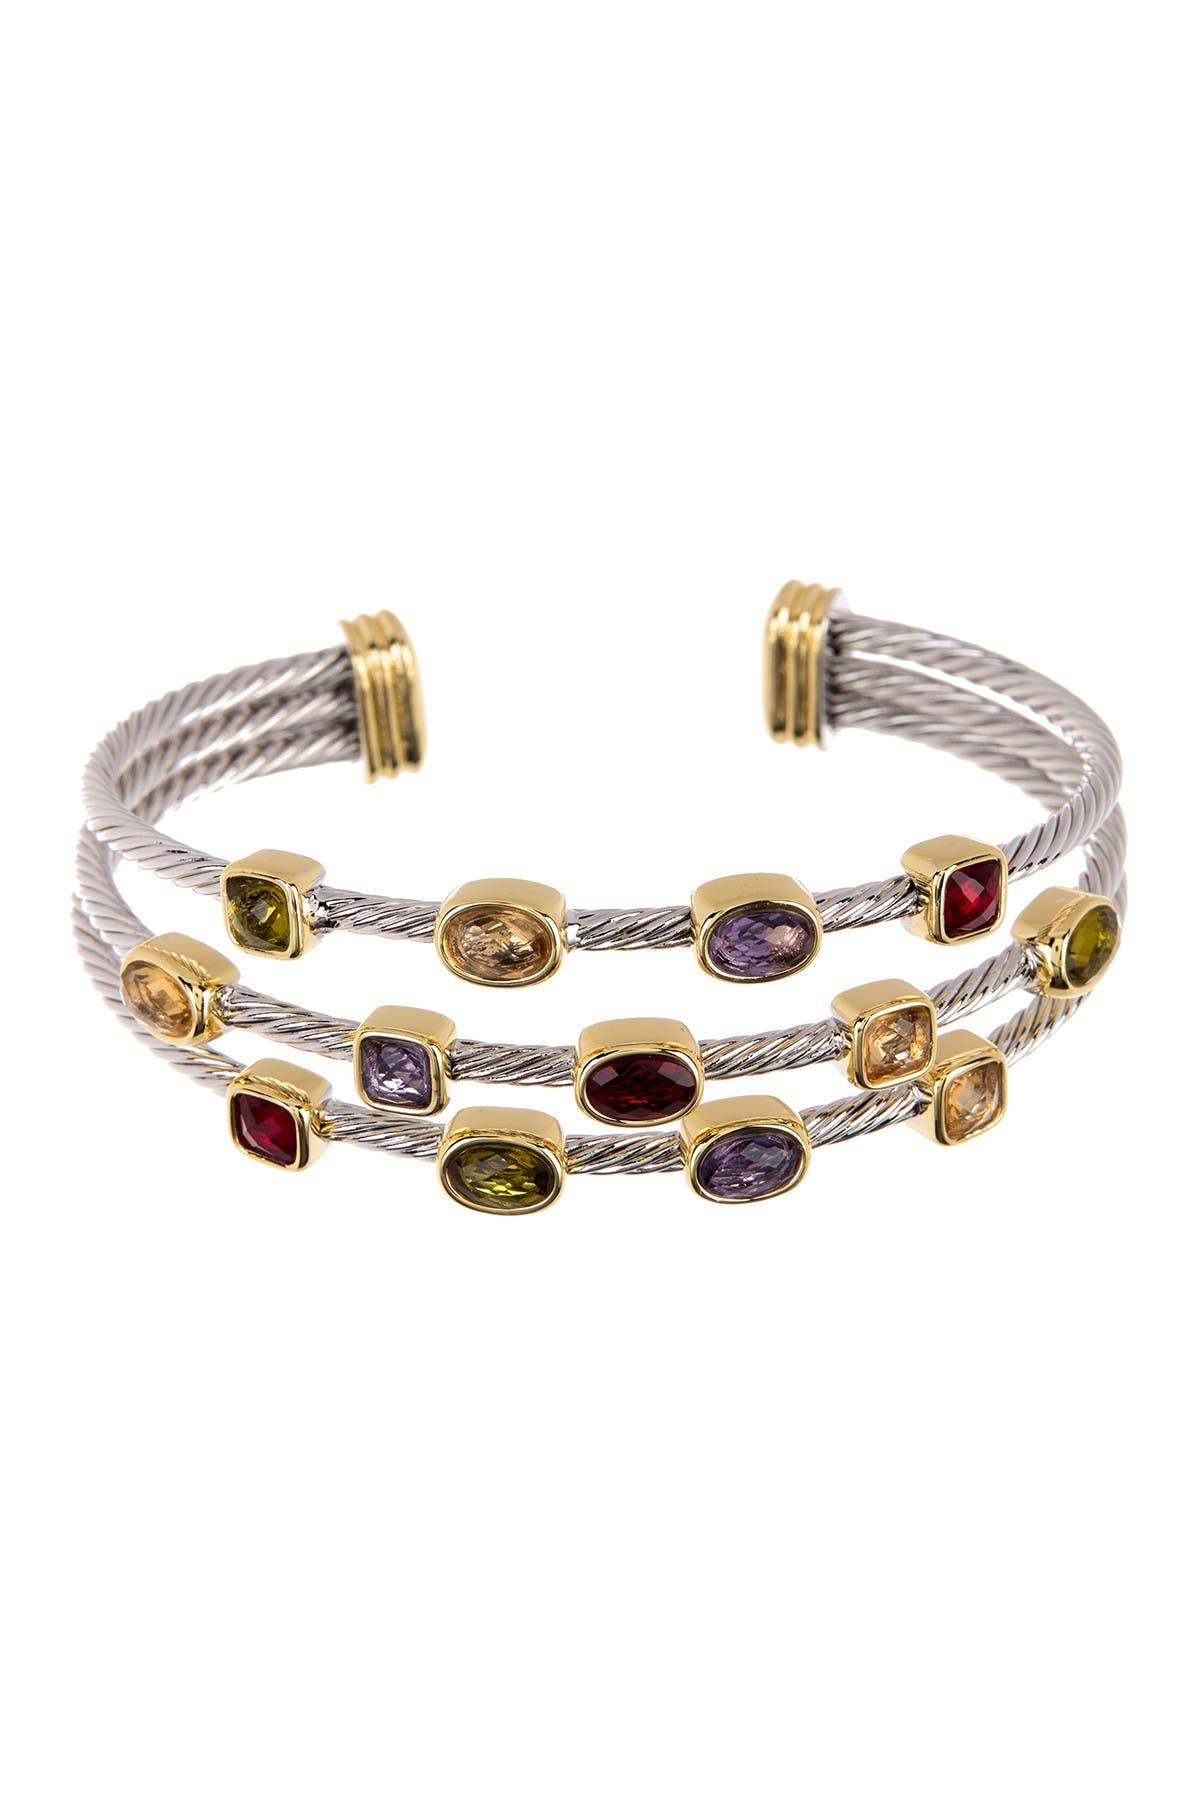 Image of Meshmerise Twisted Cable Multi-Row Stone Cuff Bracelet